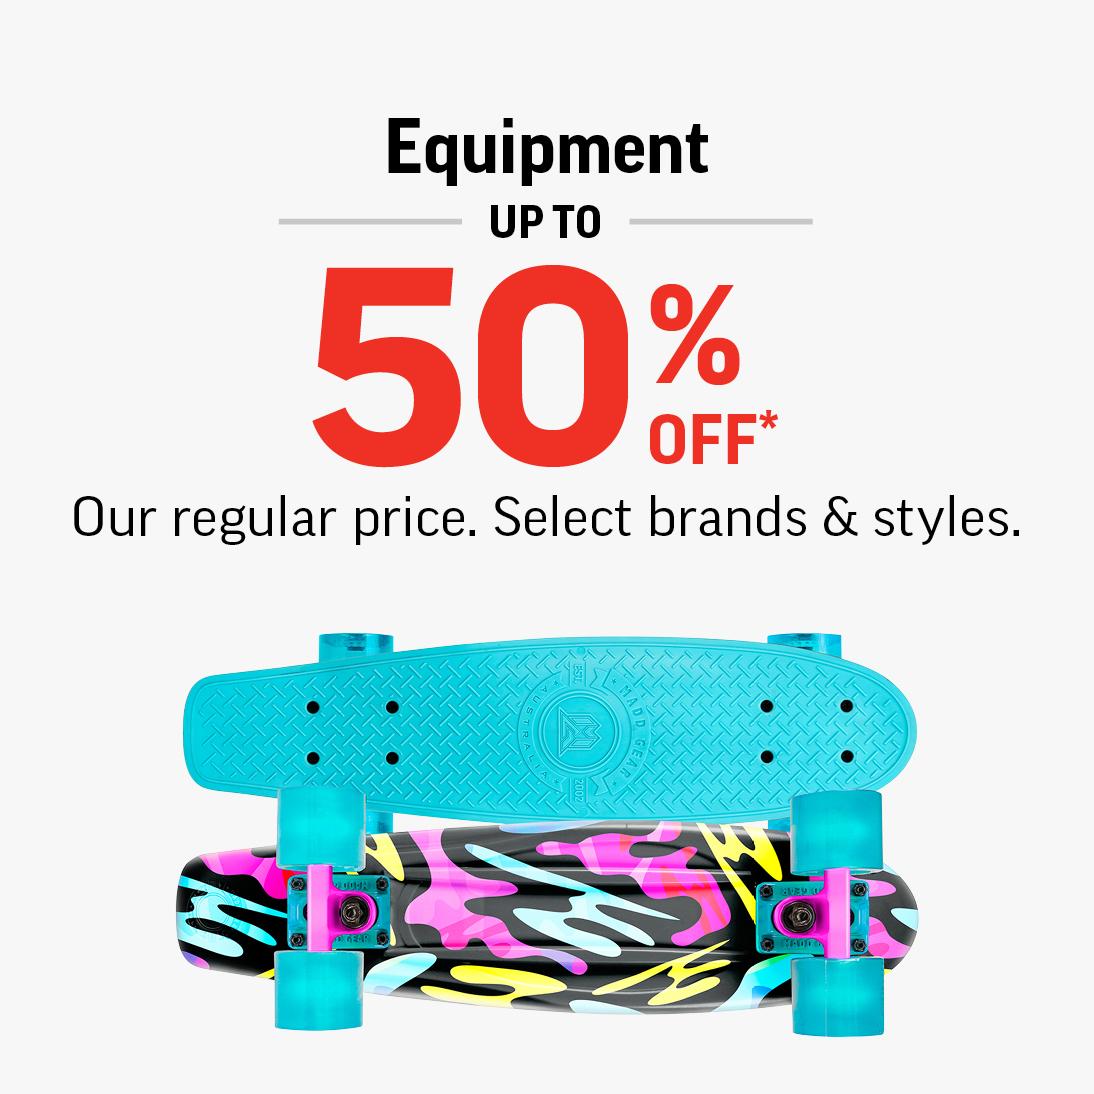 blue patterned skateboard